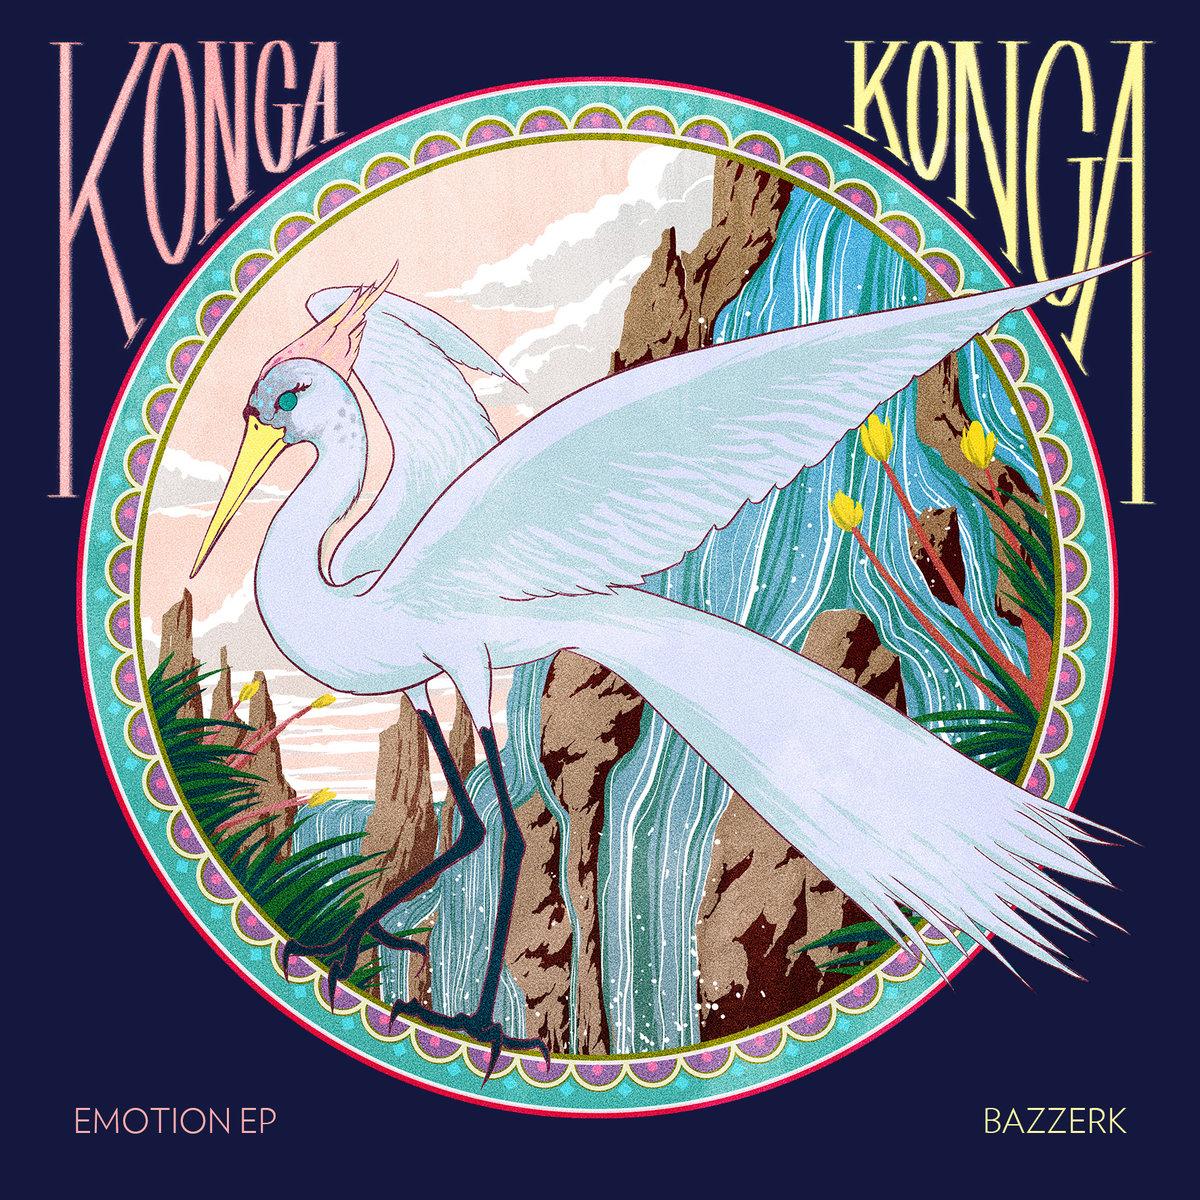 konga konga emotion ep bazzerk Sanghon Kim couvre x chefs